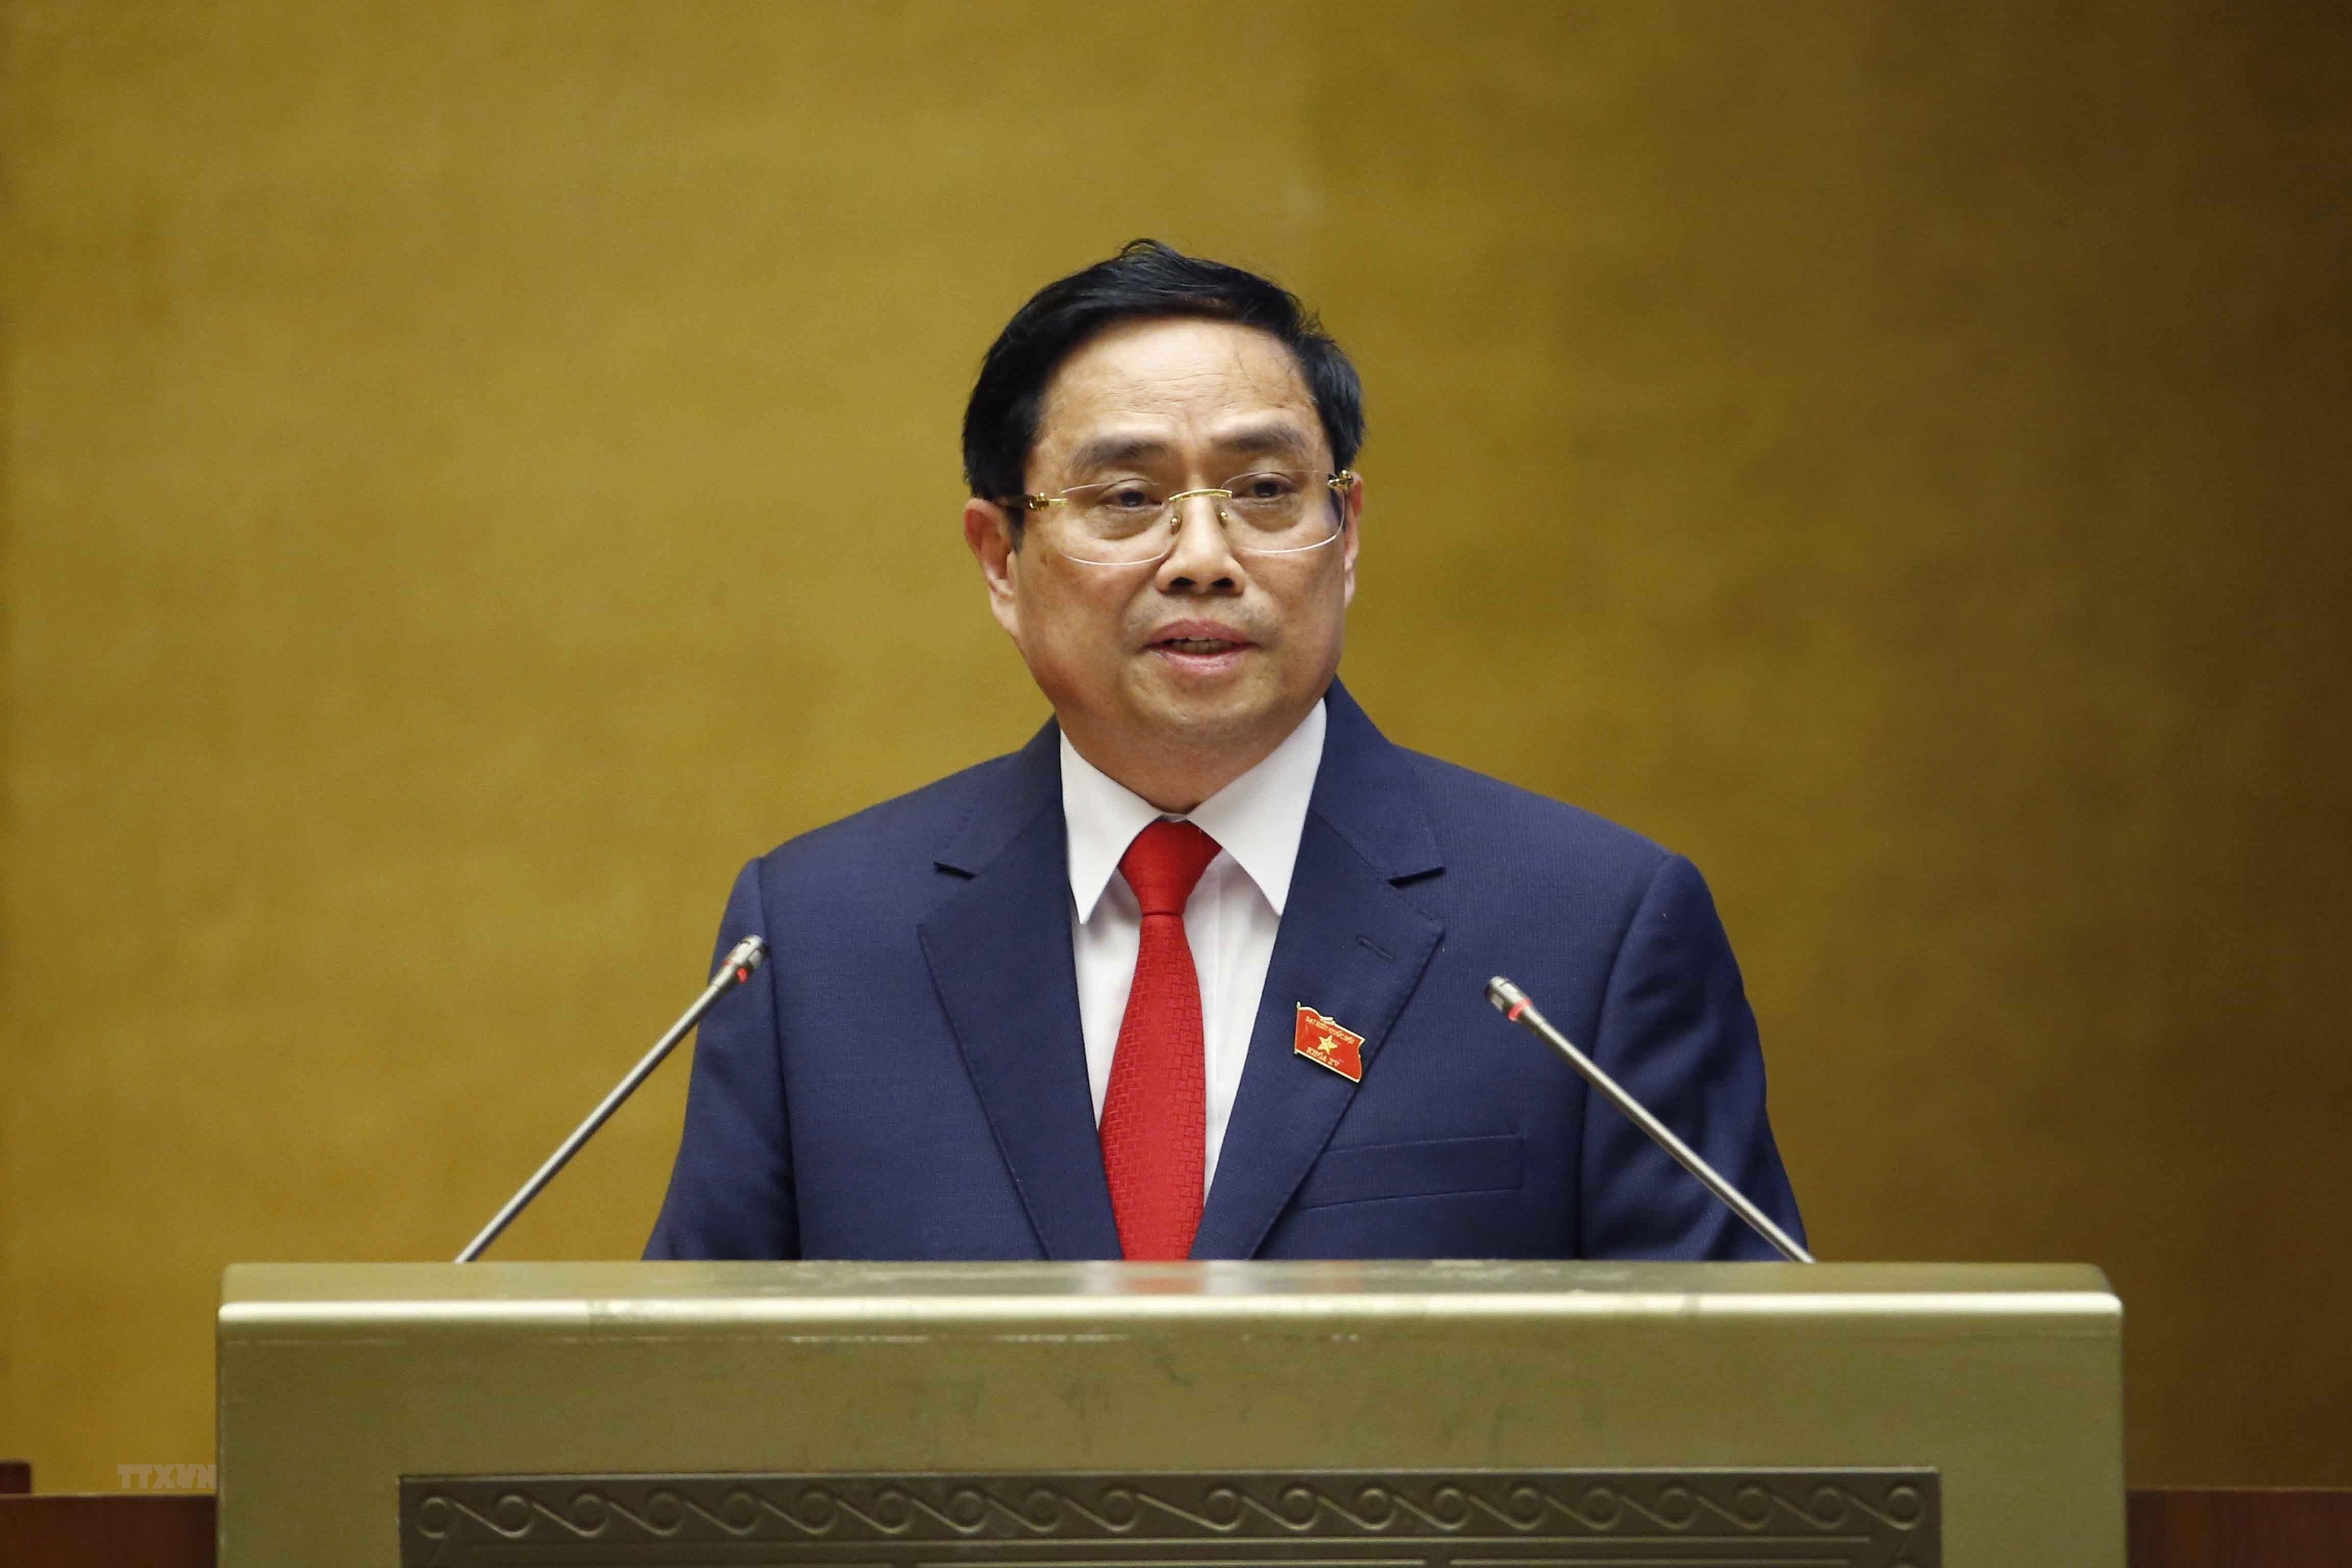 Hinh anh ong Pham Minh Chinh nham chuc Thu tuong Chinh phu hinh anh 10